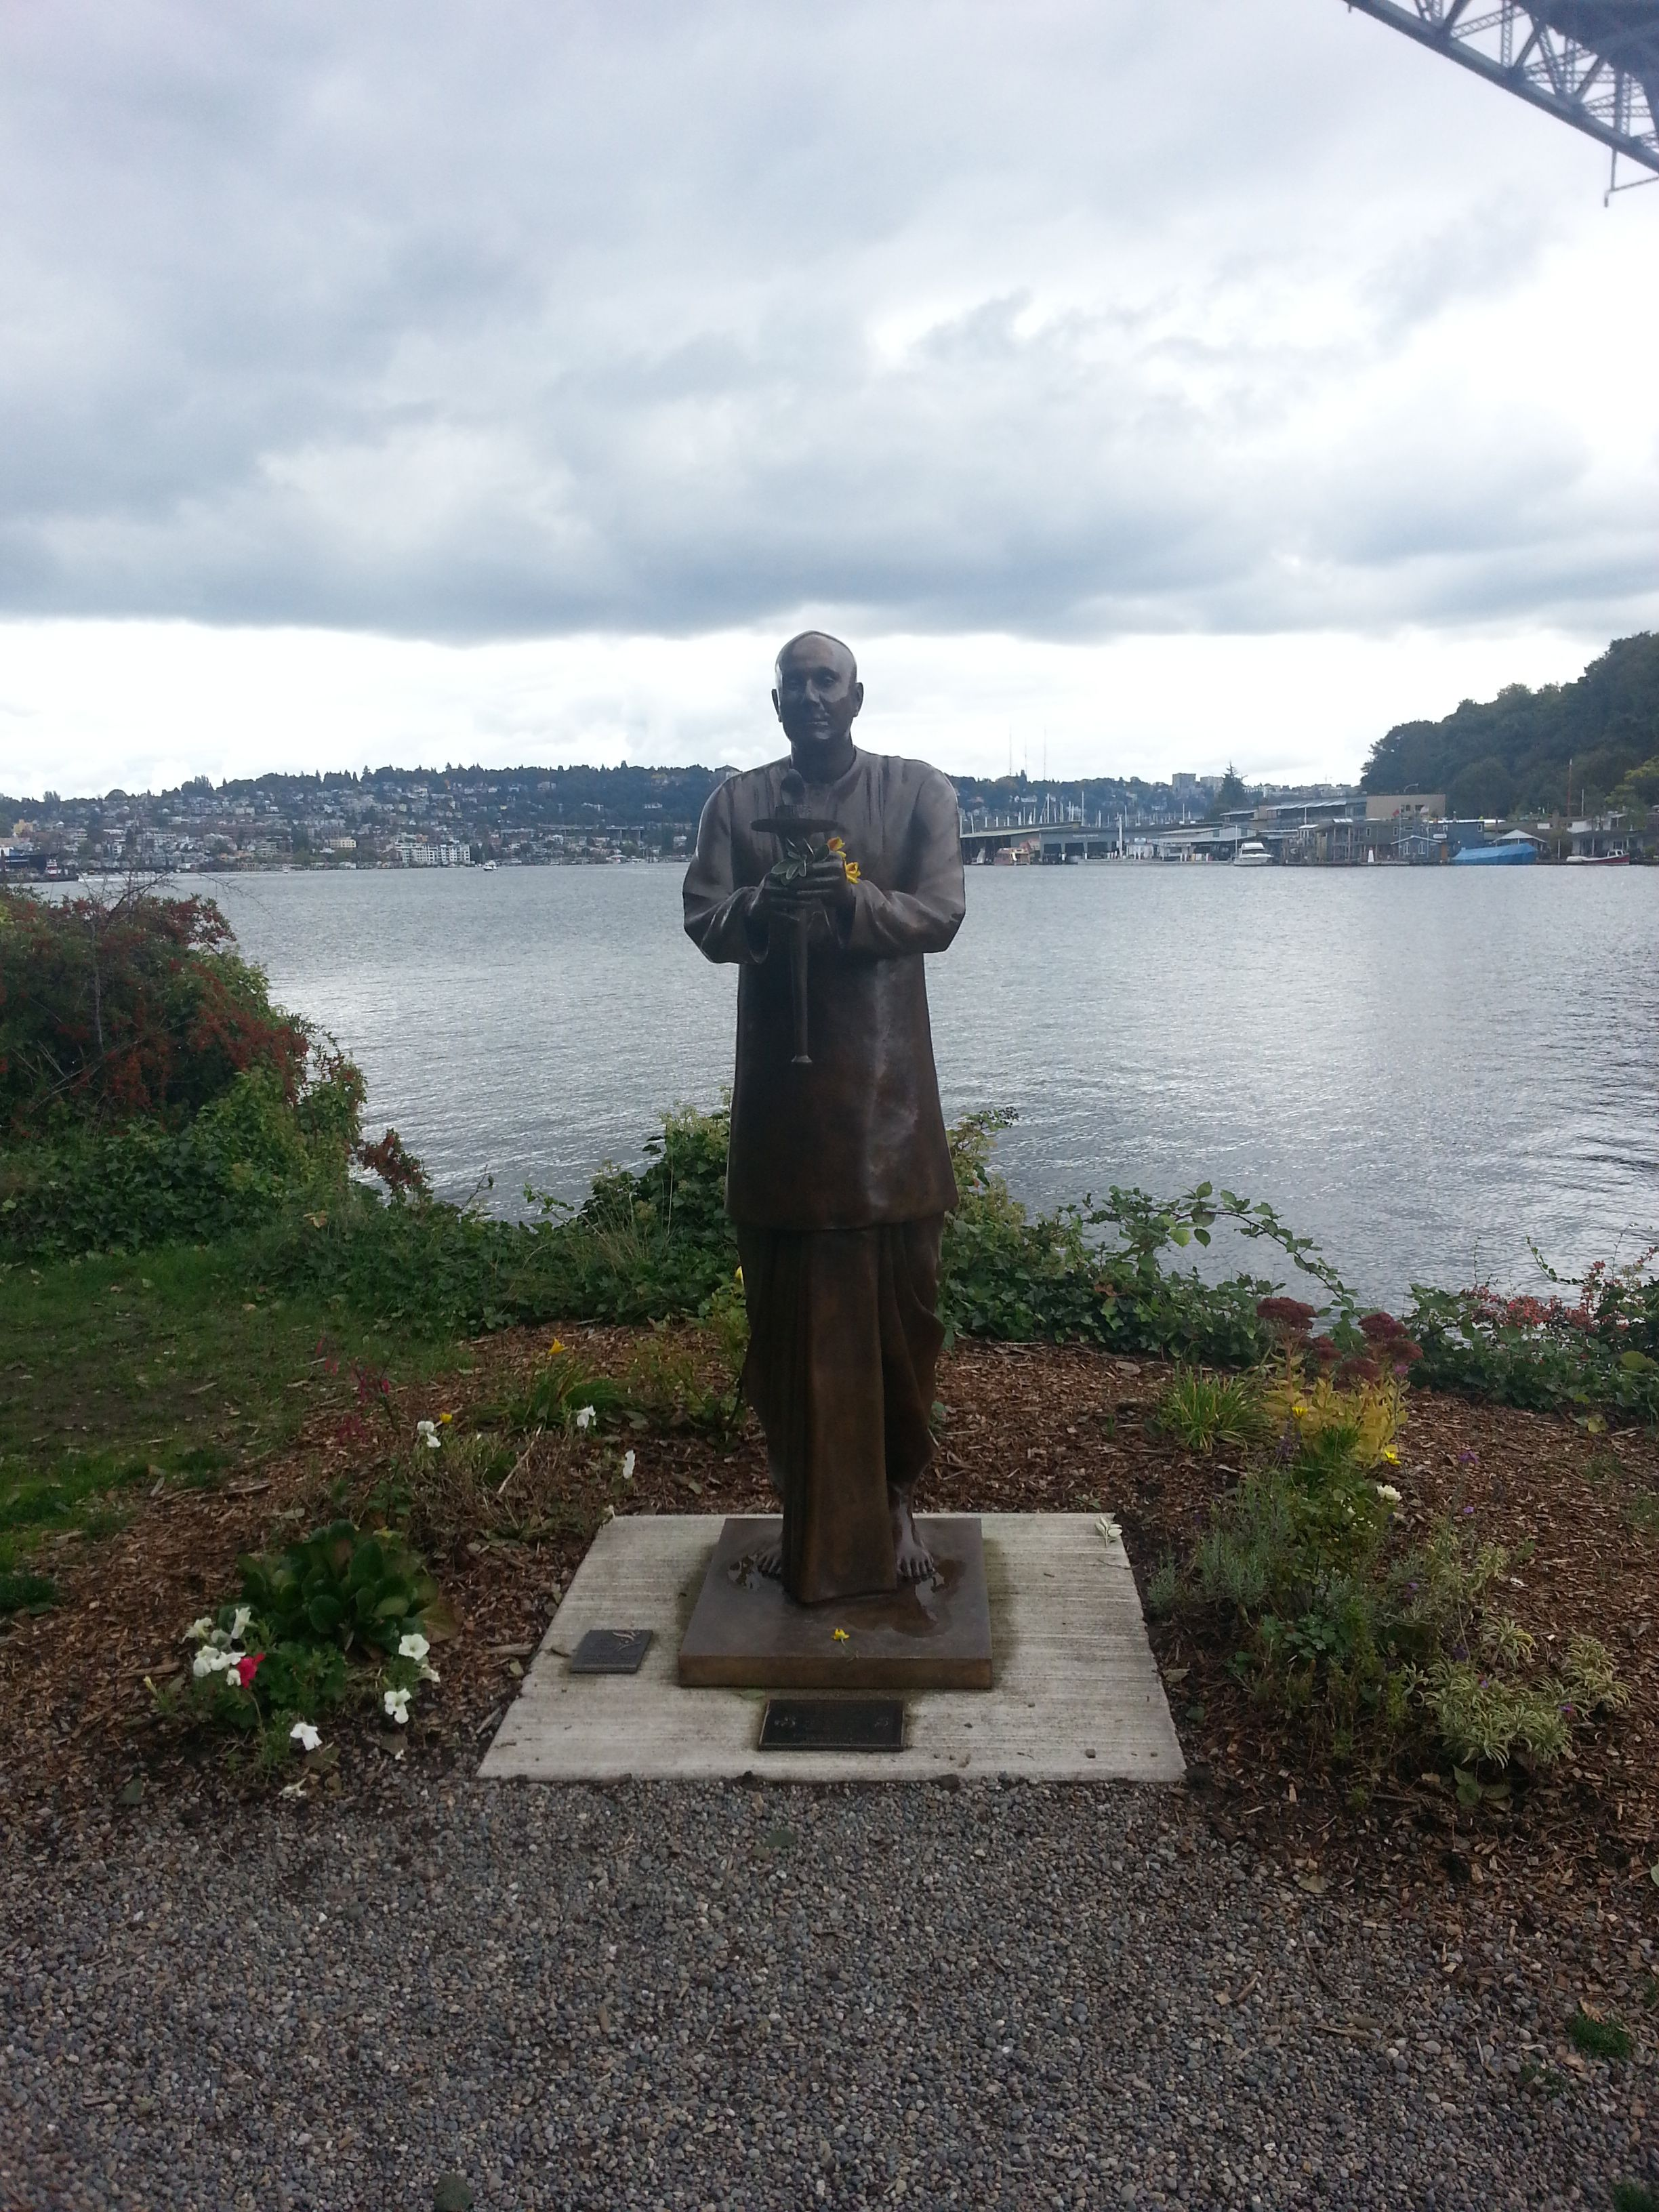 Sri Chinmoy Memorial Statue South Lake Union